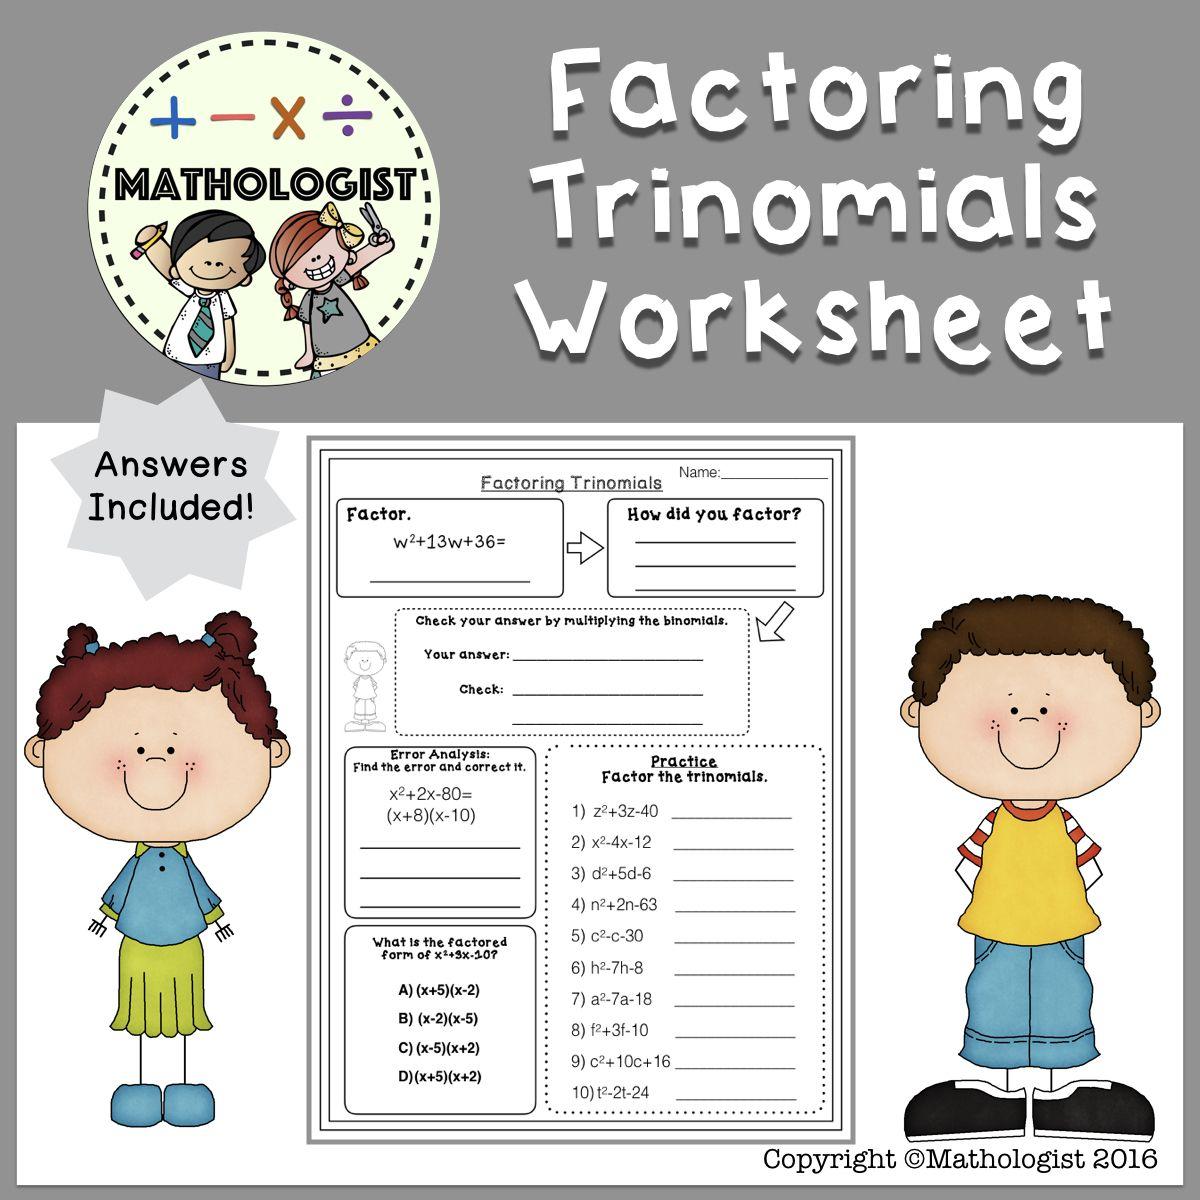 Factoring Trinomials Worksheet Algebra Ax2 Bx C A 1 Students Can